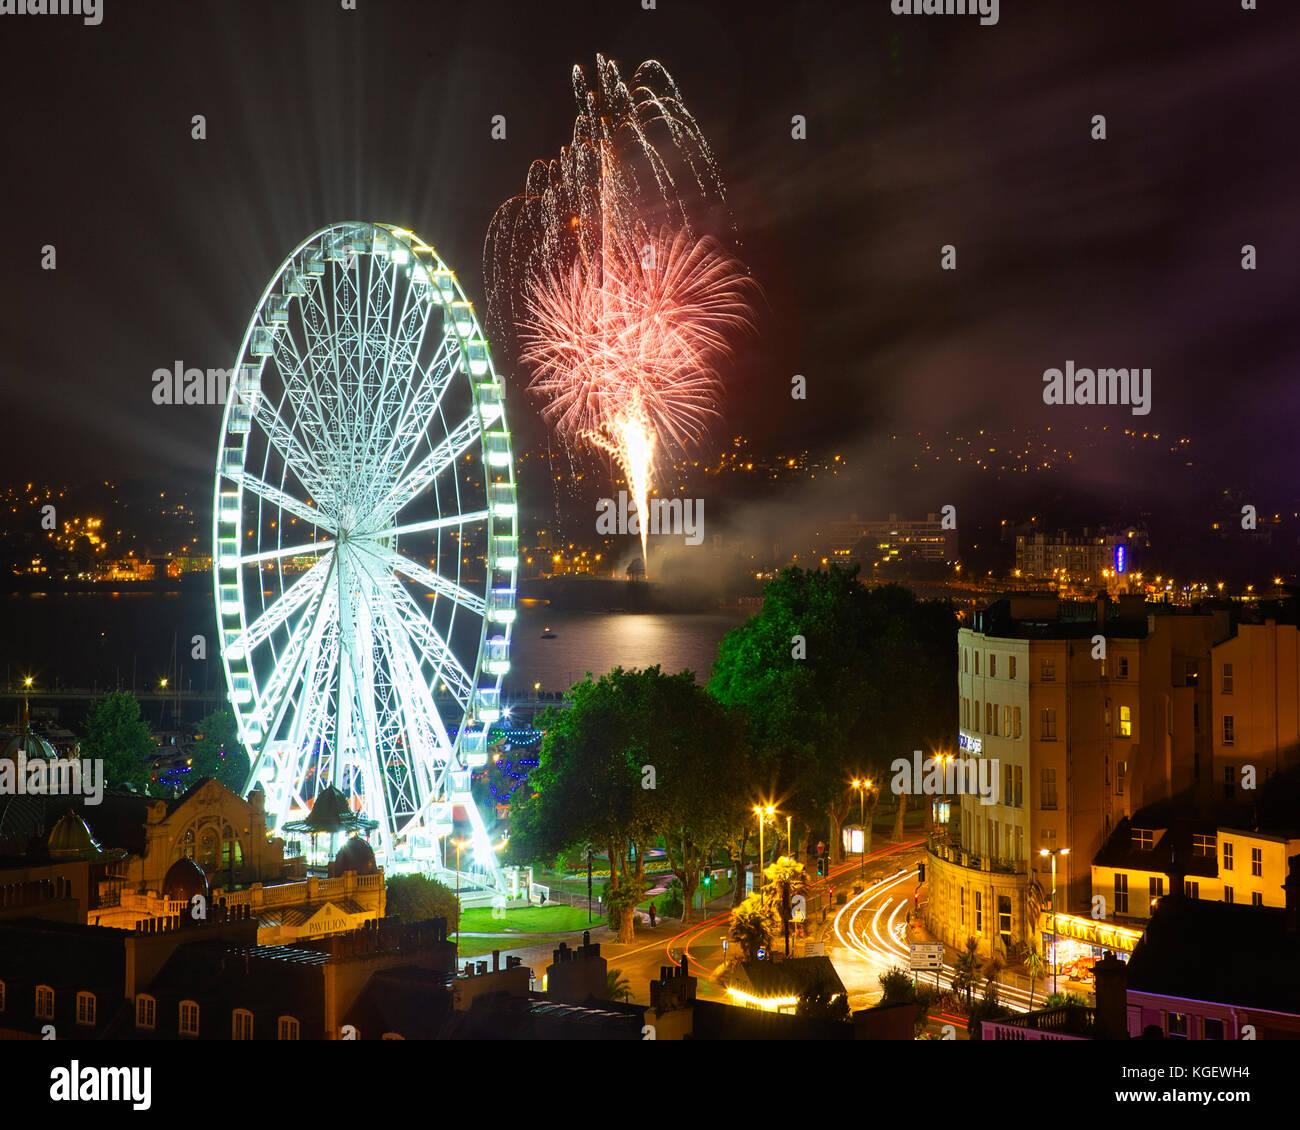 GB - DEVON: Fireworks over Torquay Stock Photo